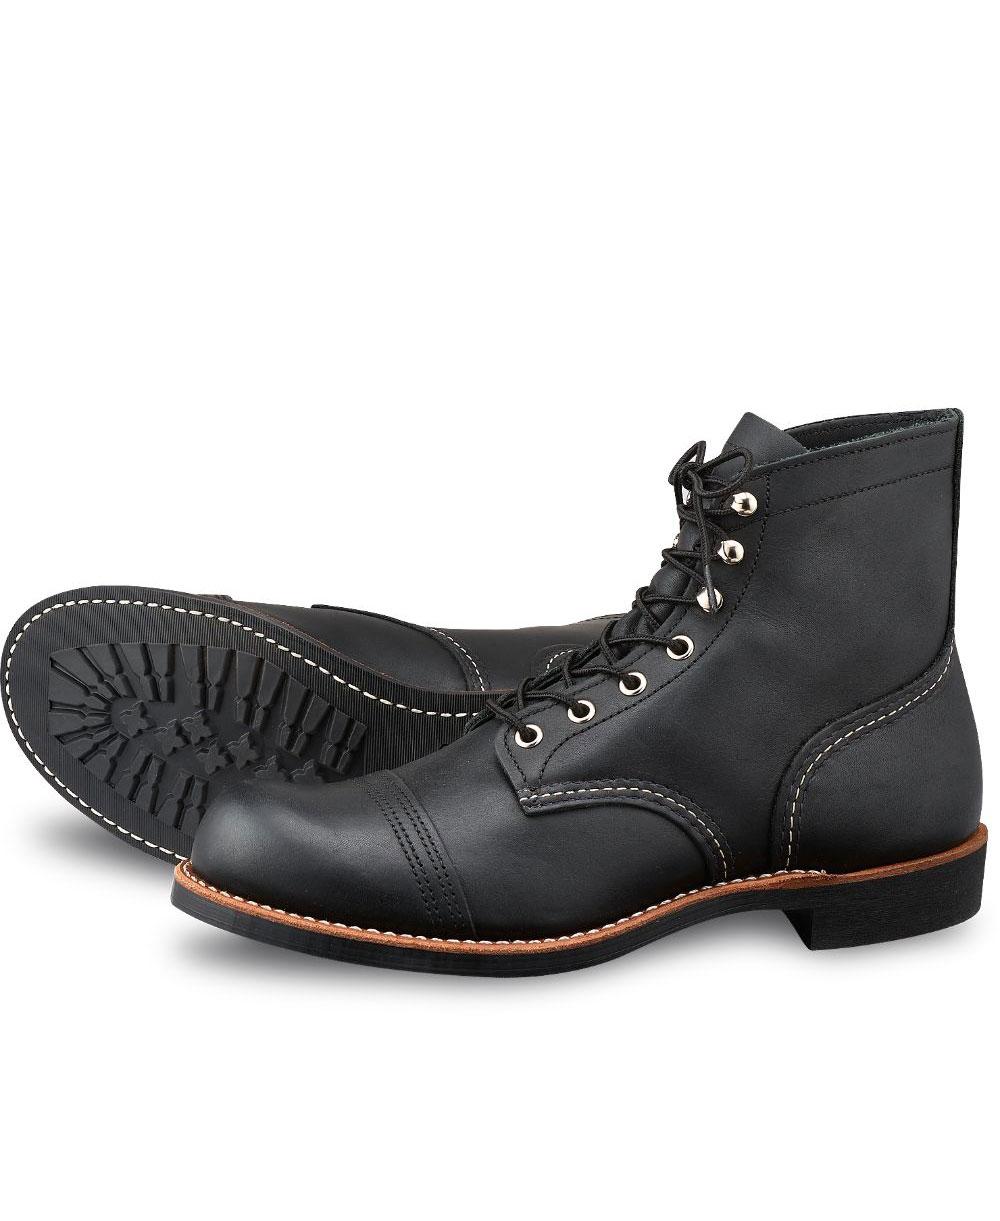 Men's Iron Ranger Leather Boots 8084